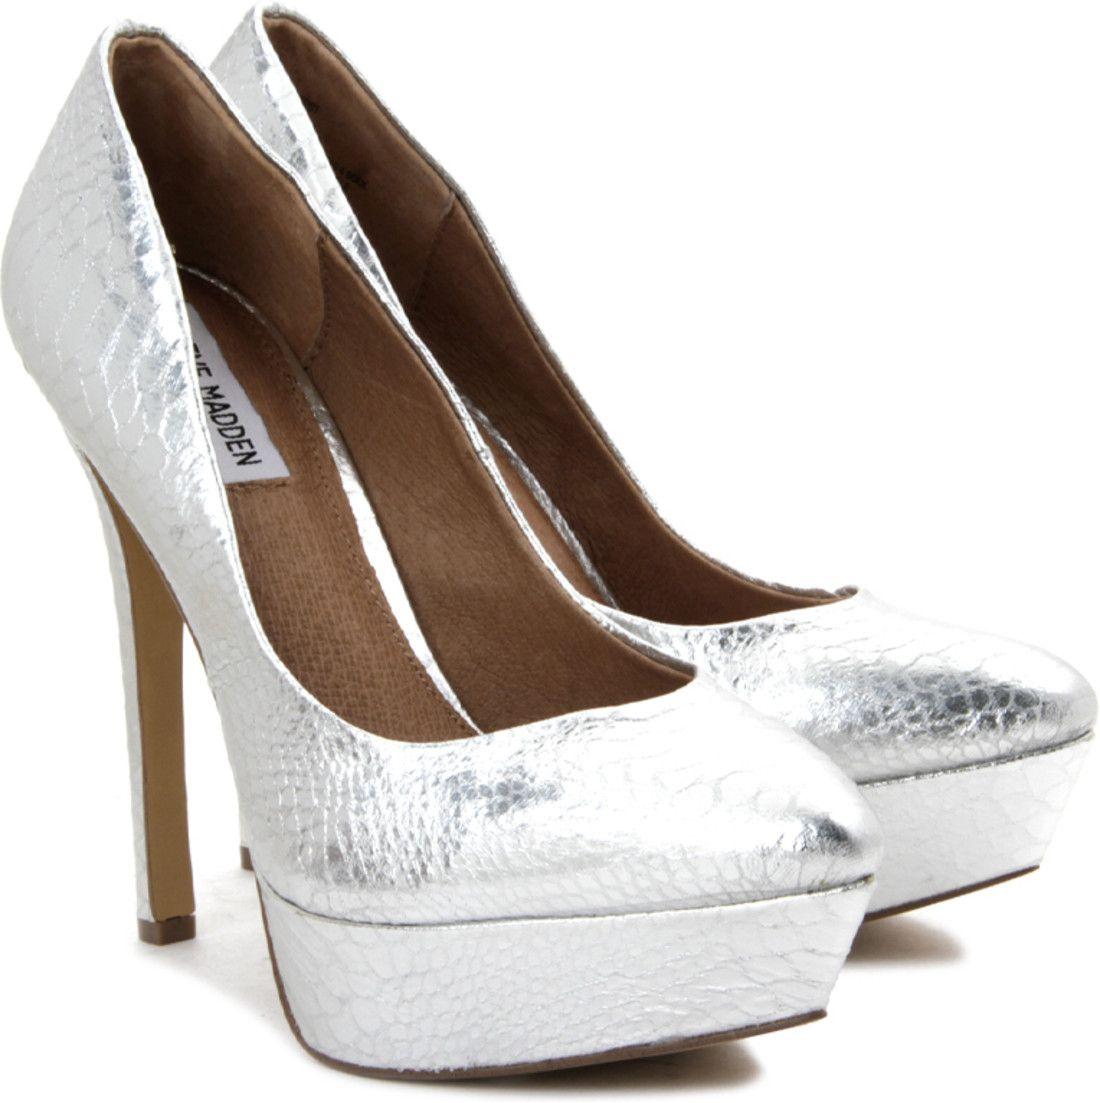 Steve Madden Artist Heels - Buy Silver Color Steve Madden Artist ...